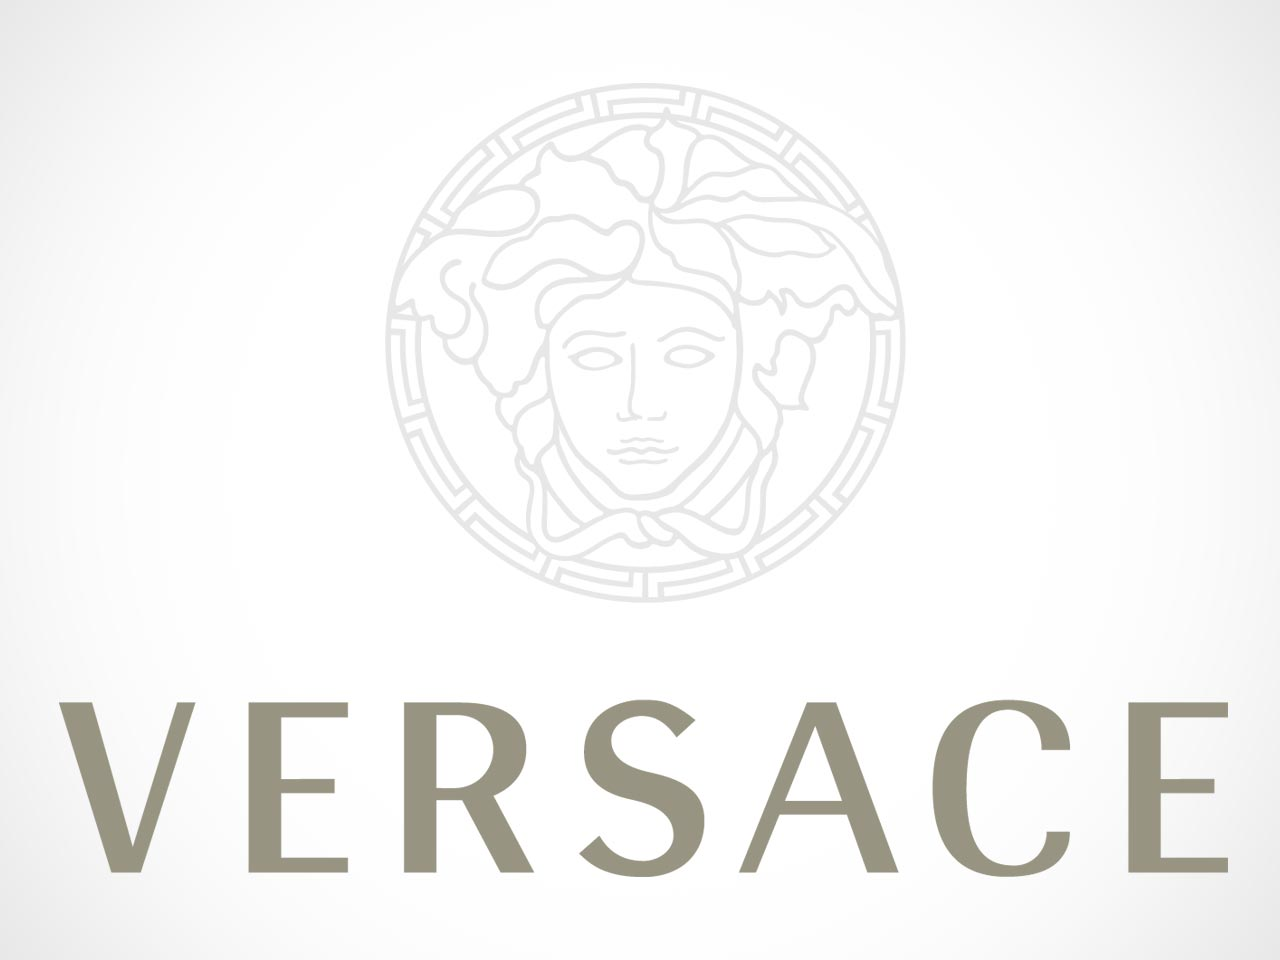 Versace Logo on white background.